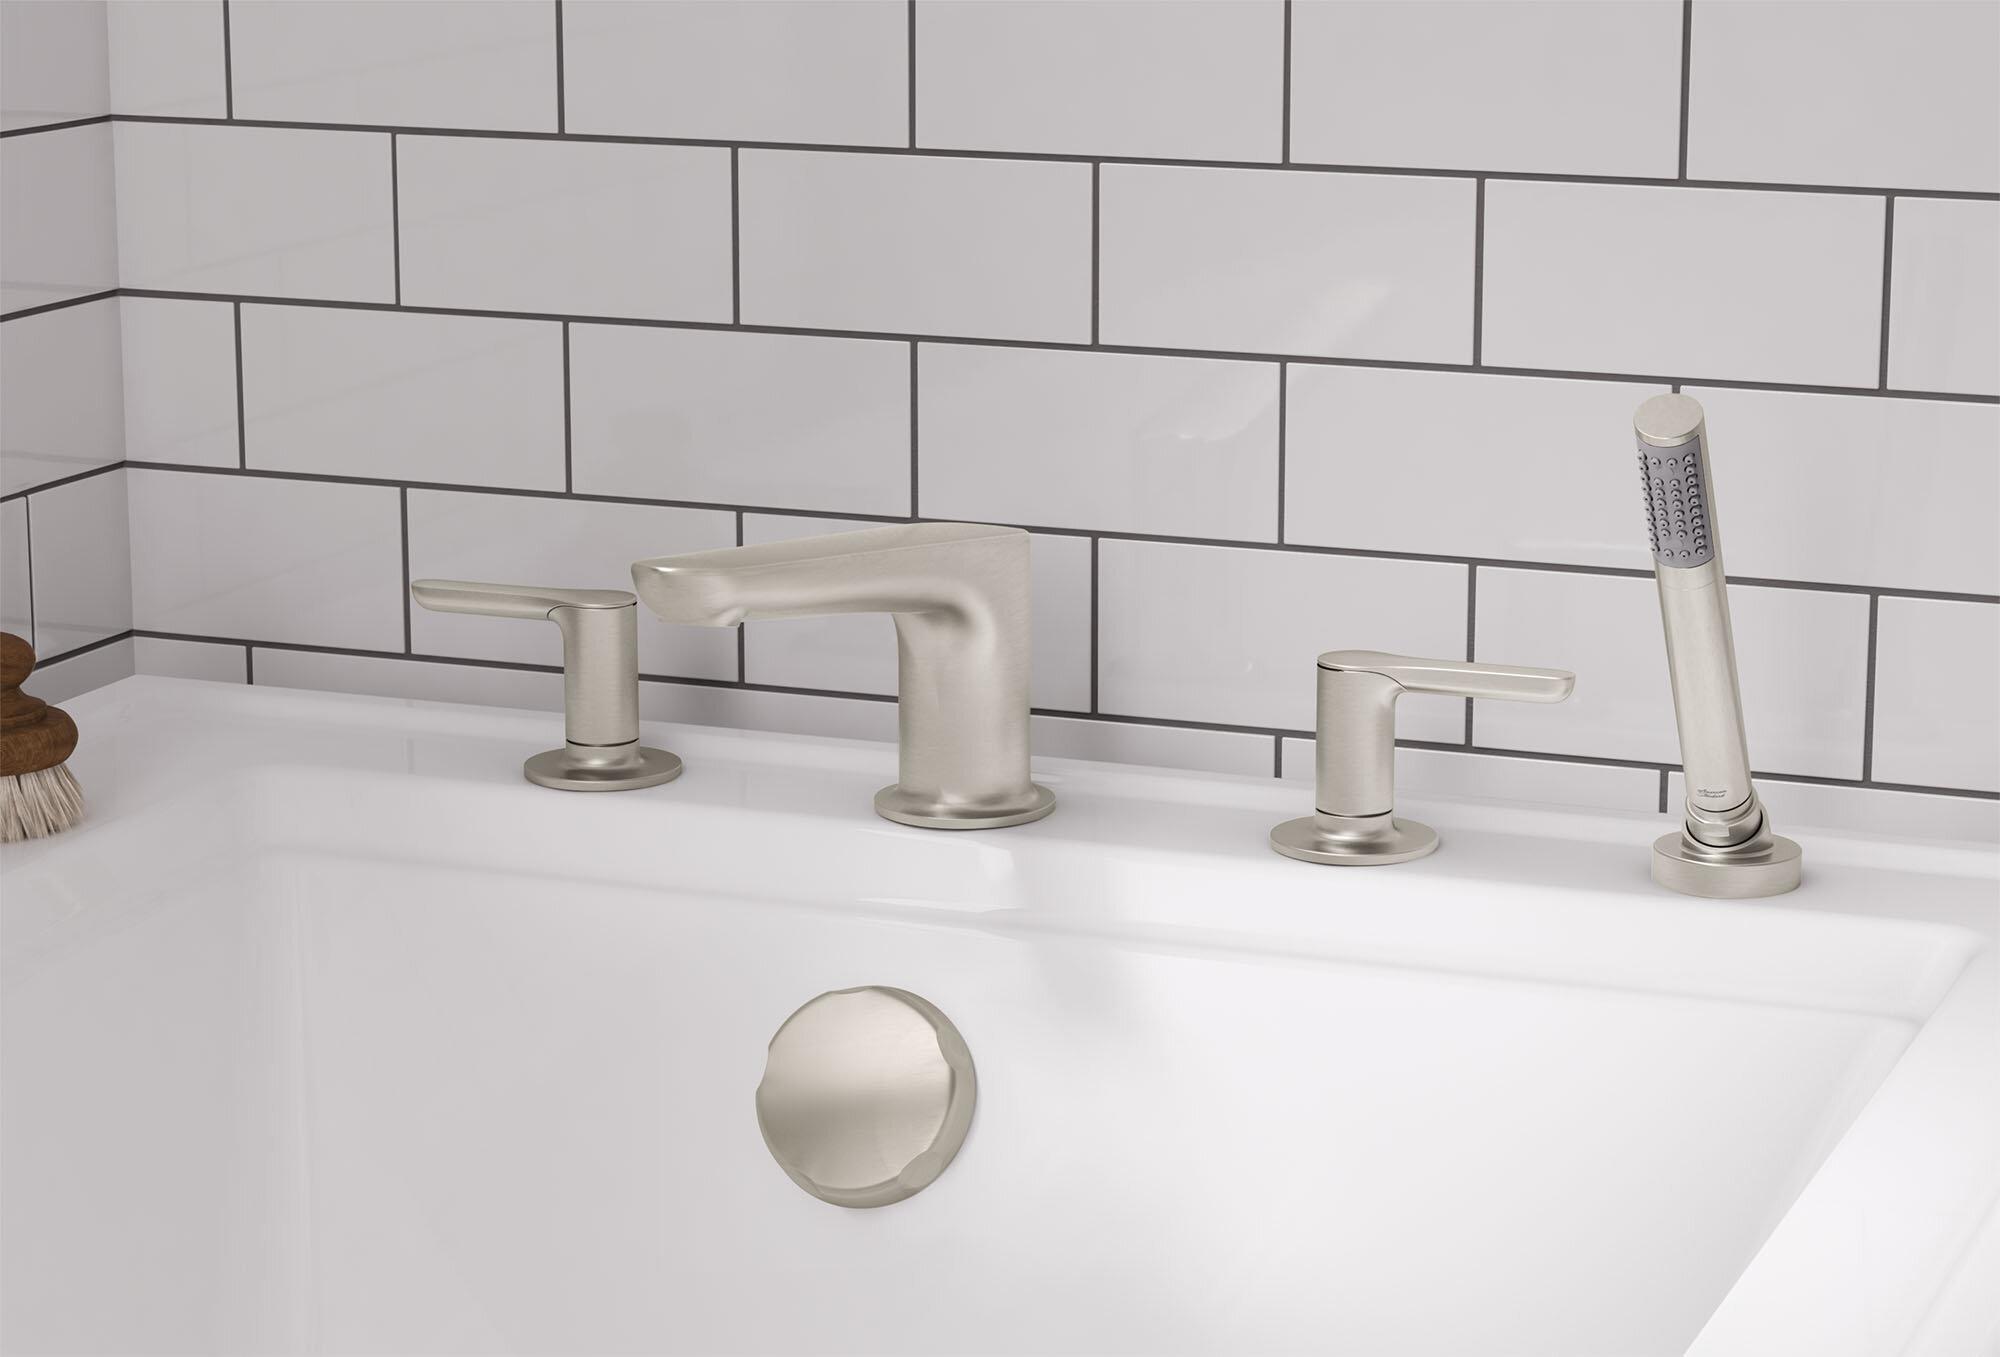 Dollhouse Miniature Bathroom Bath Shower Tap Waterfall Model Toy BILU